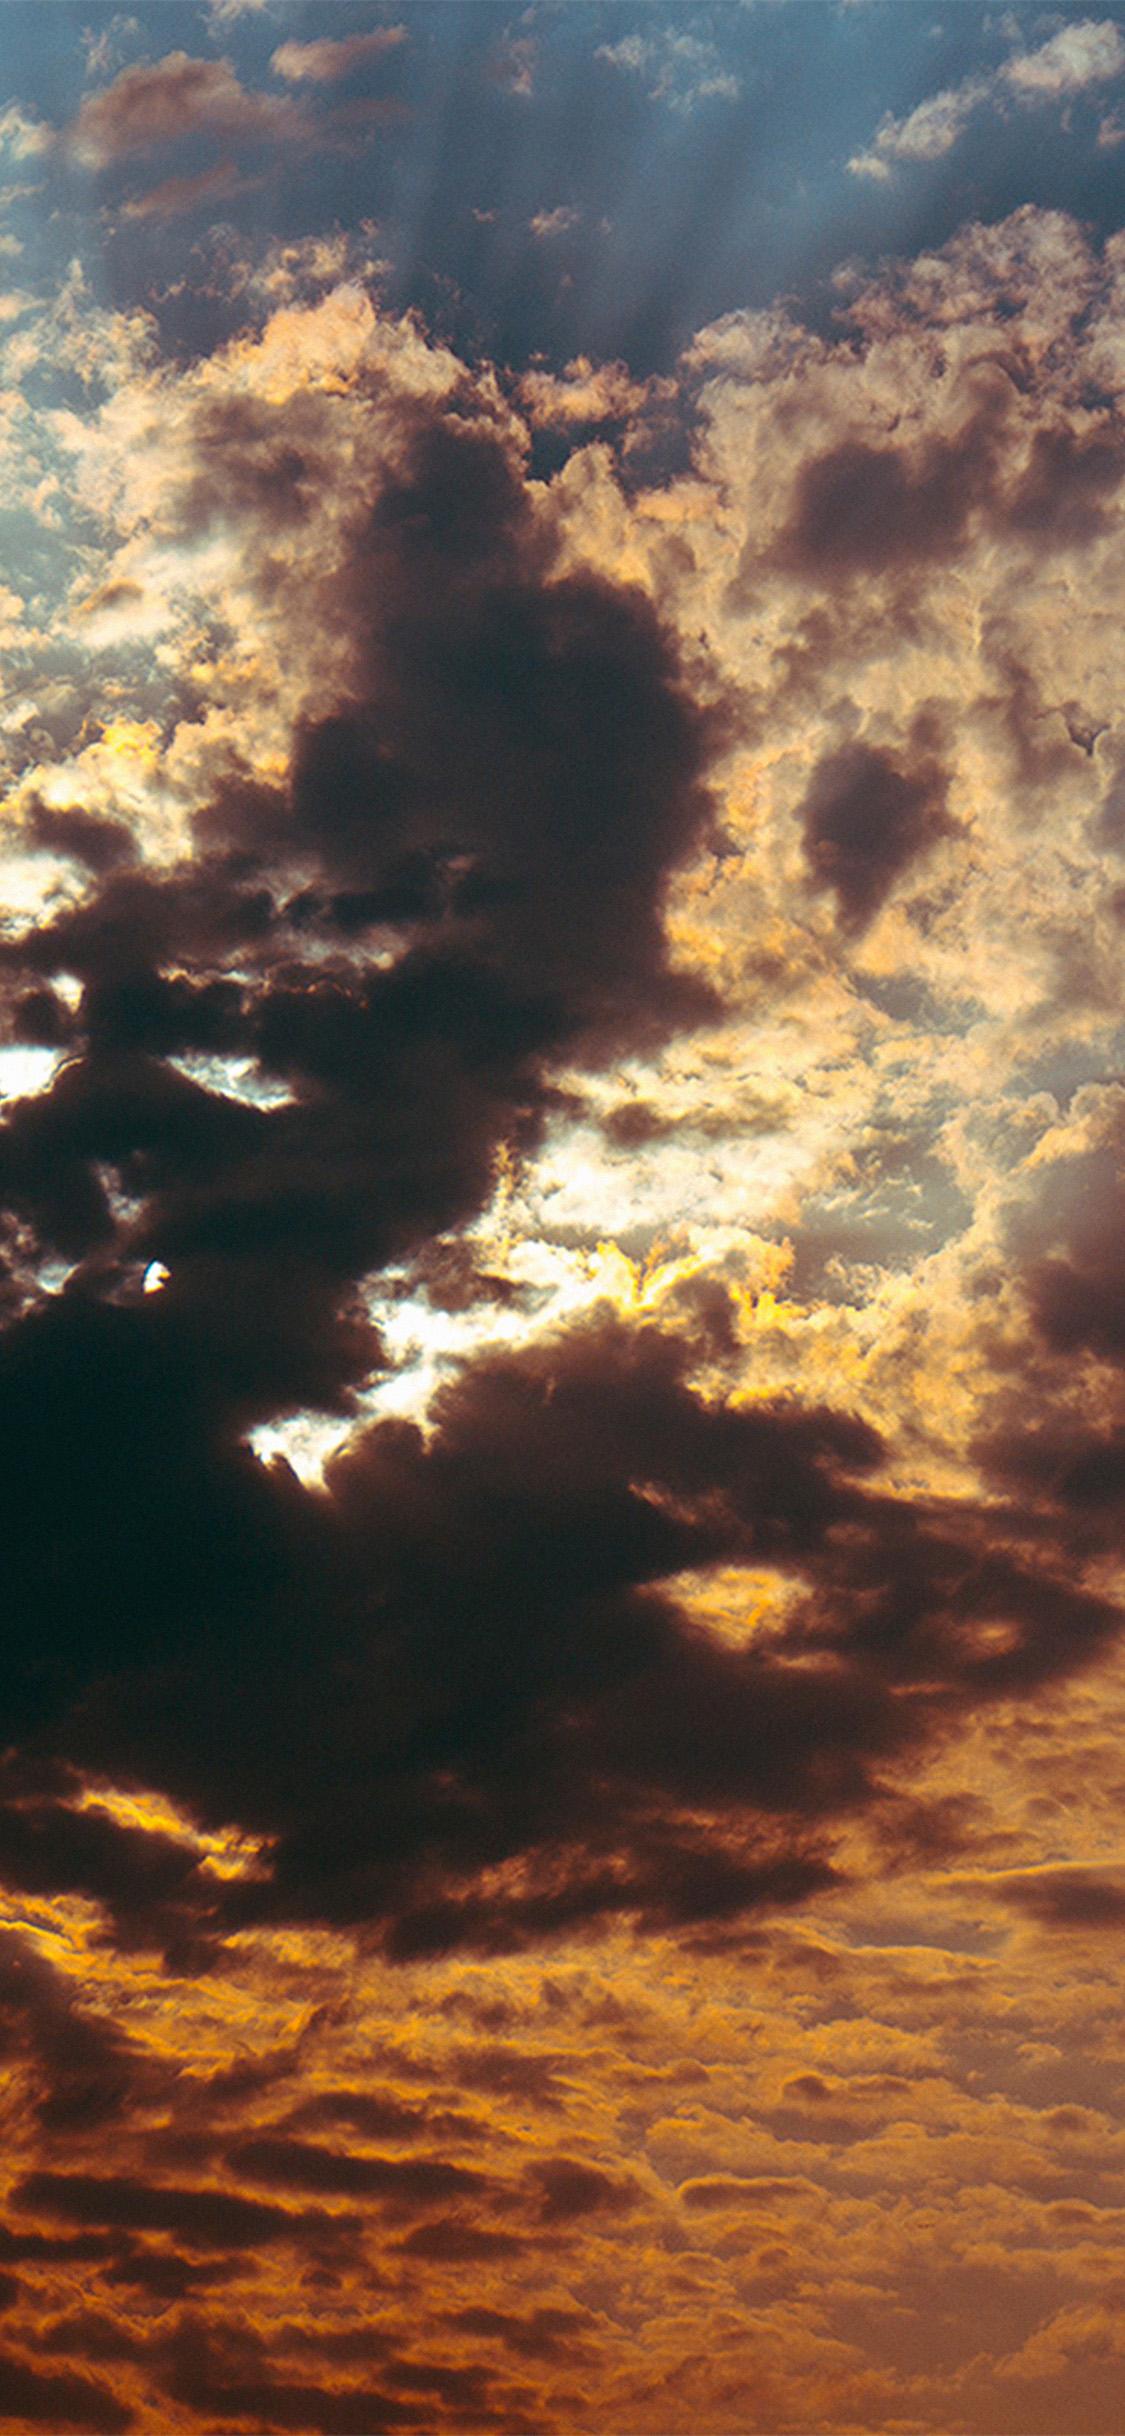 iPhonexpapers.com-Apple-iPhone-wallpaper-nz82-sky-cloud-sun-nature